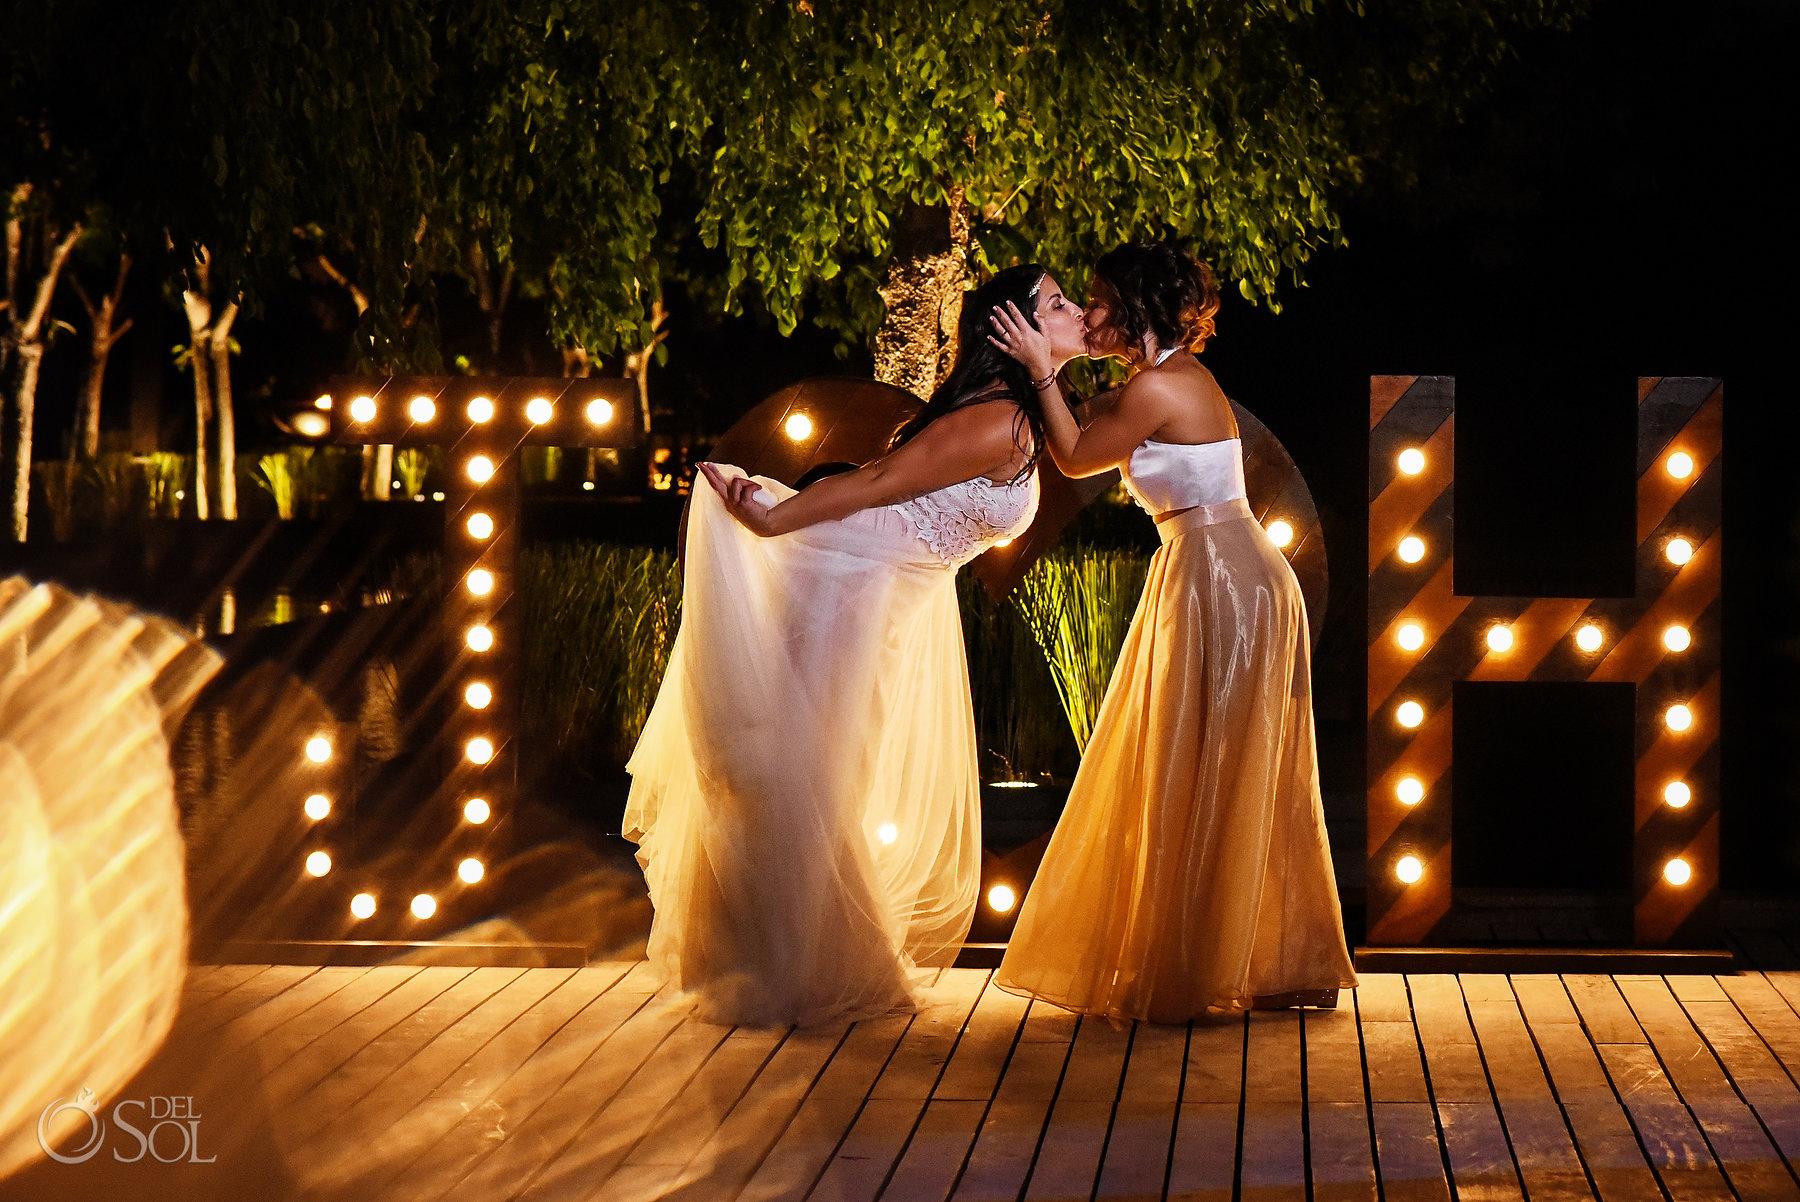 Nizuc same sex wedding two brides kiss on Akan terrace in front of custom J H illuminated sign #loveislove